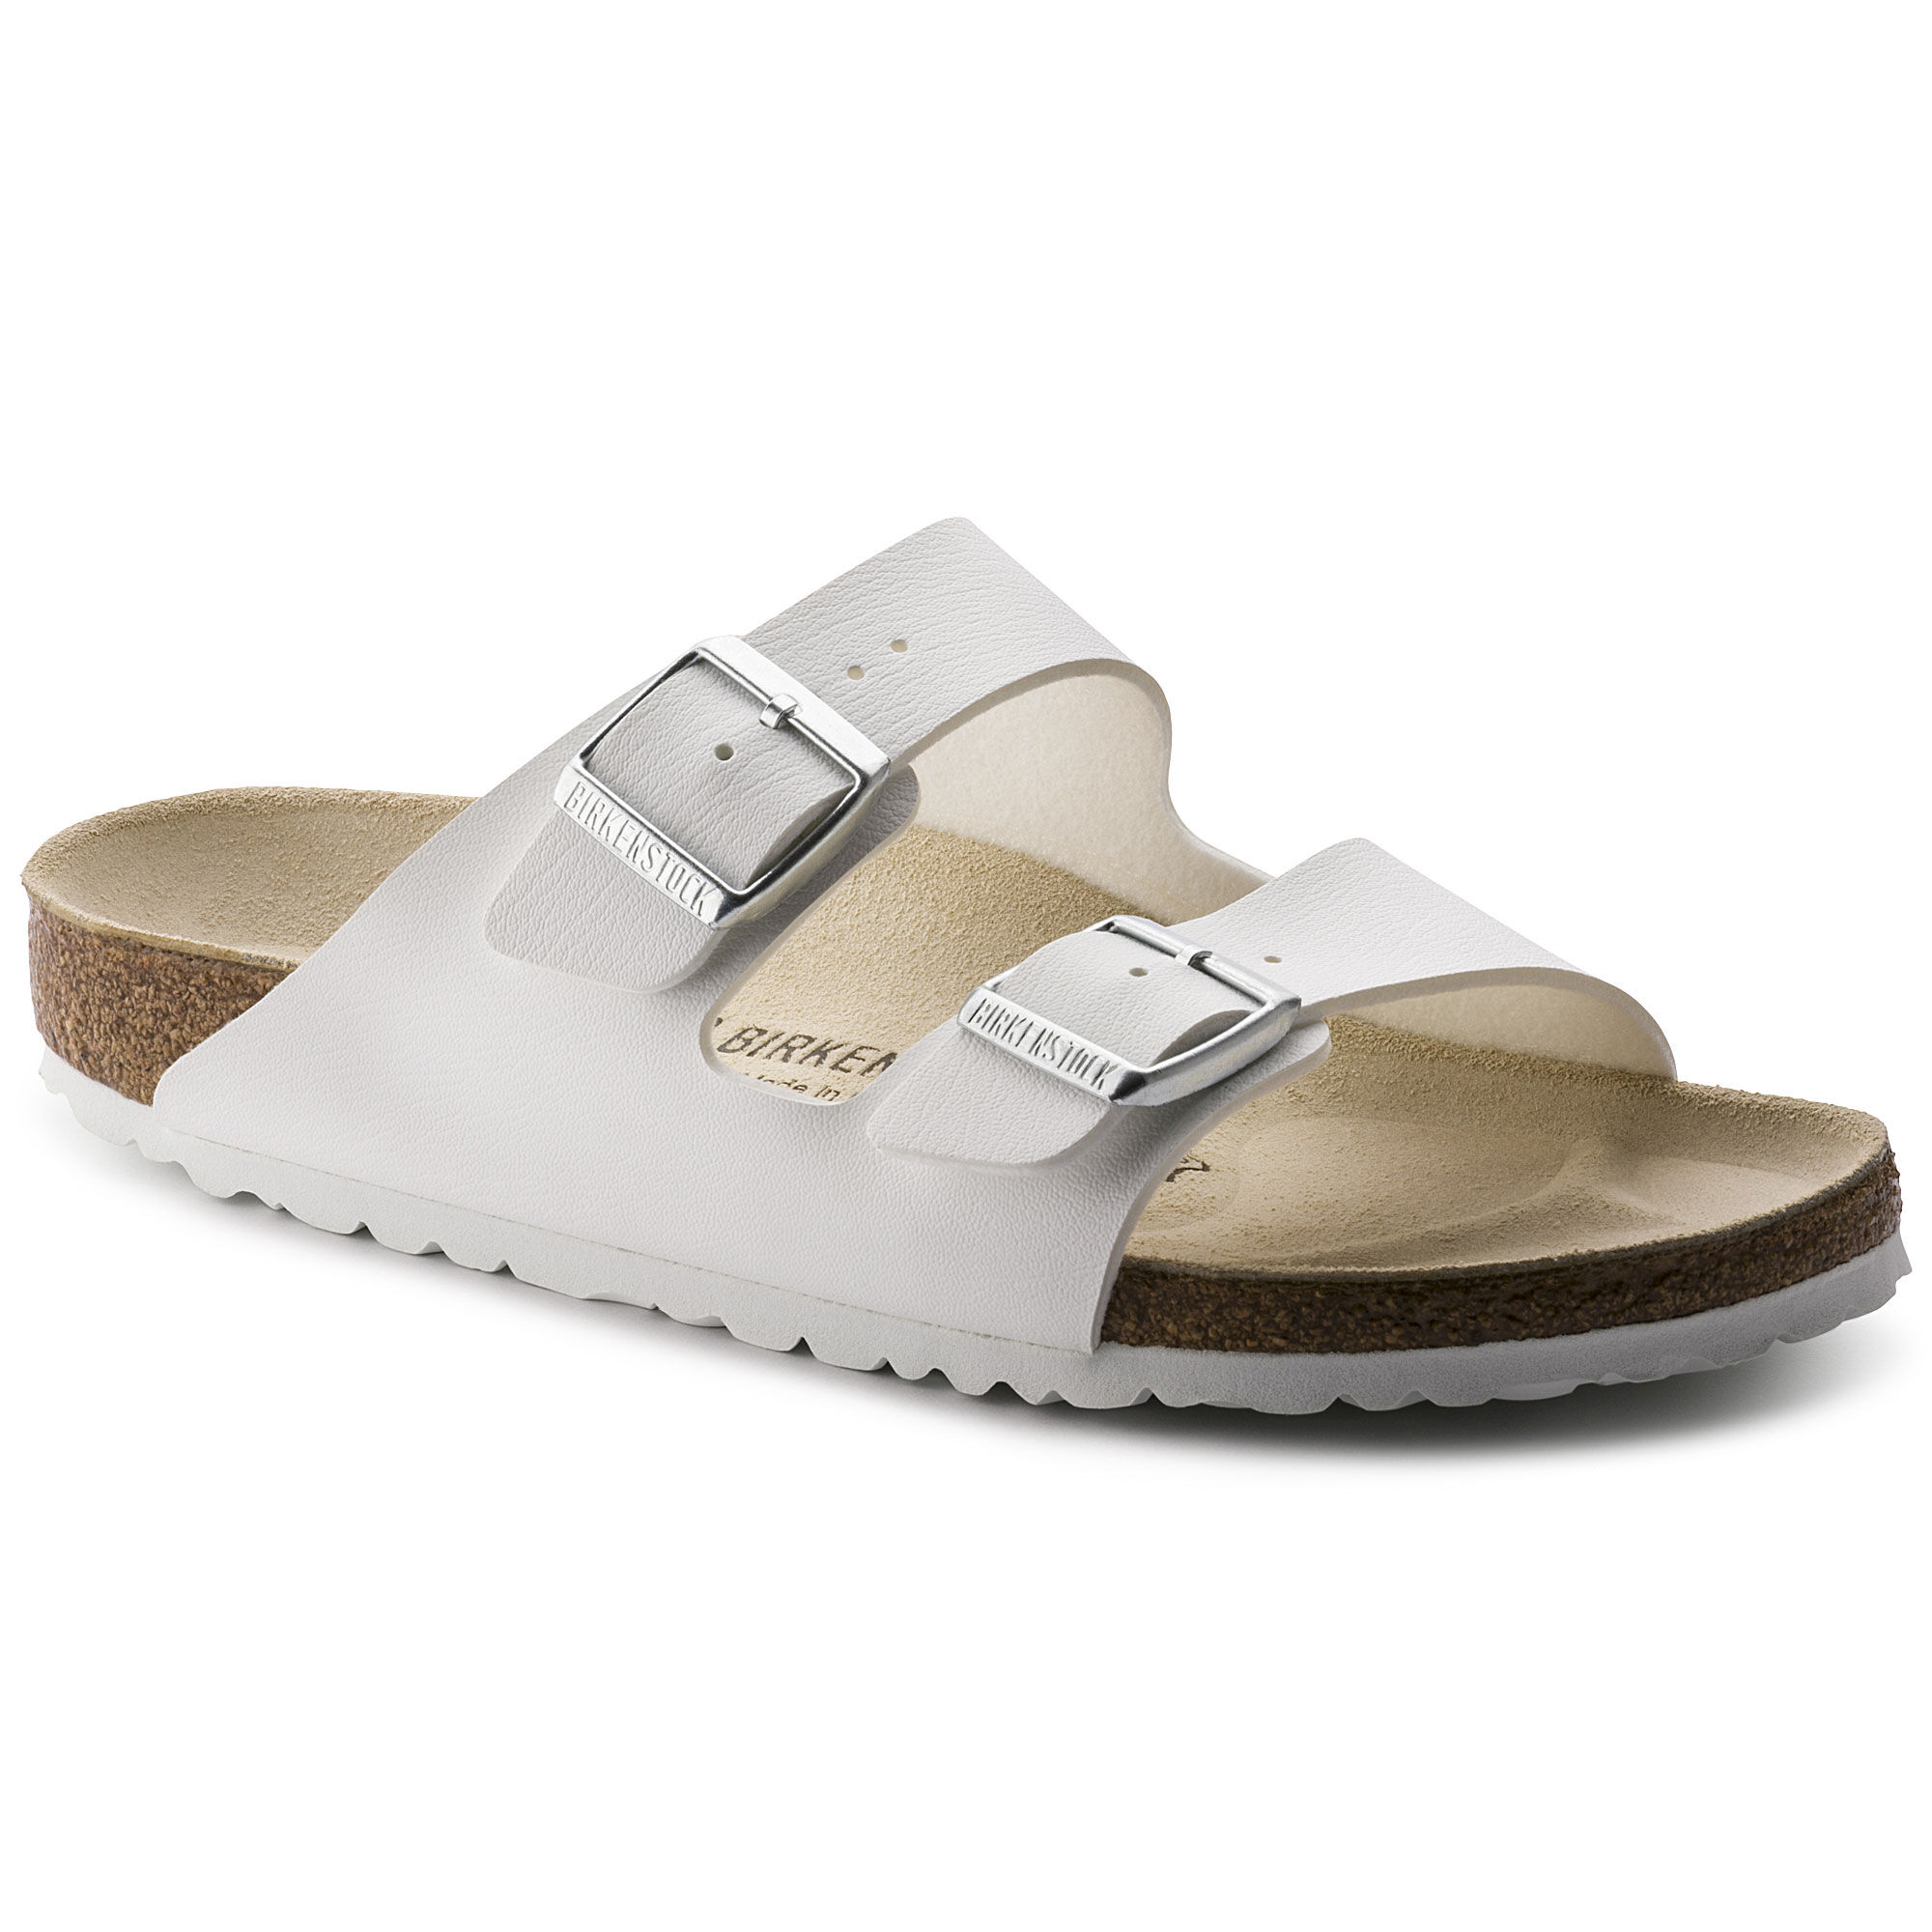 Arizona Birko-Flor White | shop online